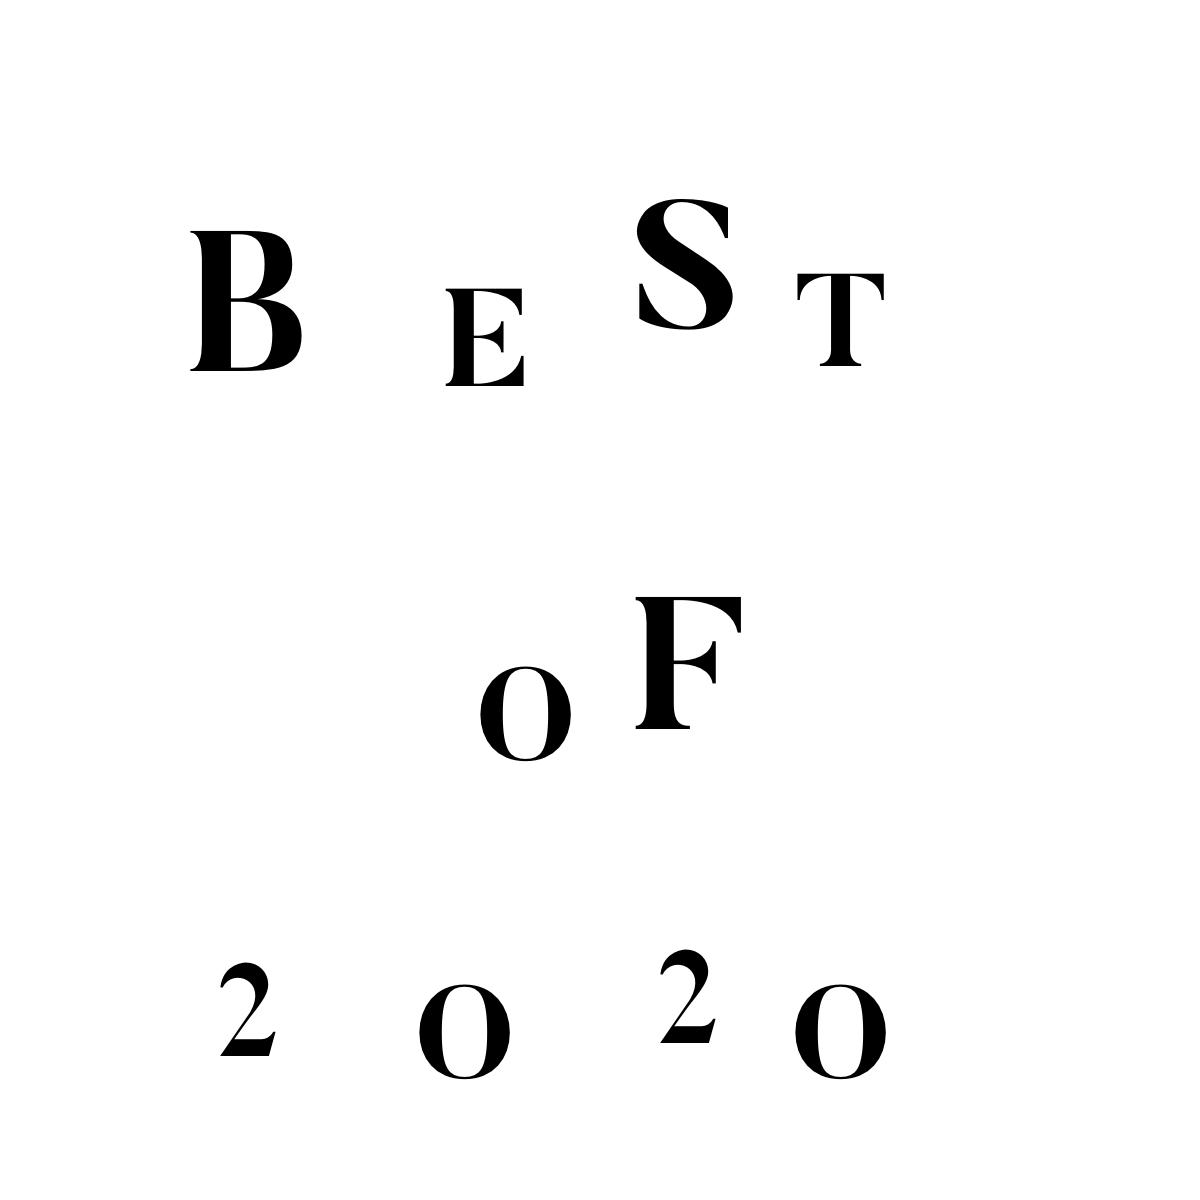 Best of - Die beliebtesten Artikel in 2020